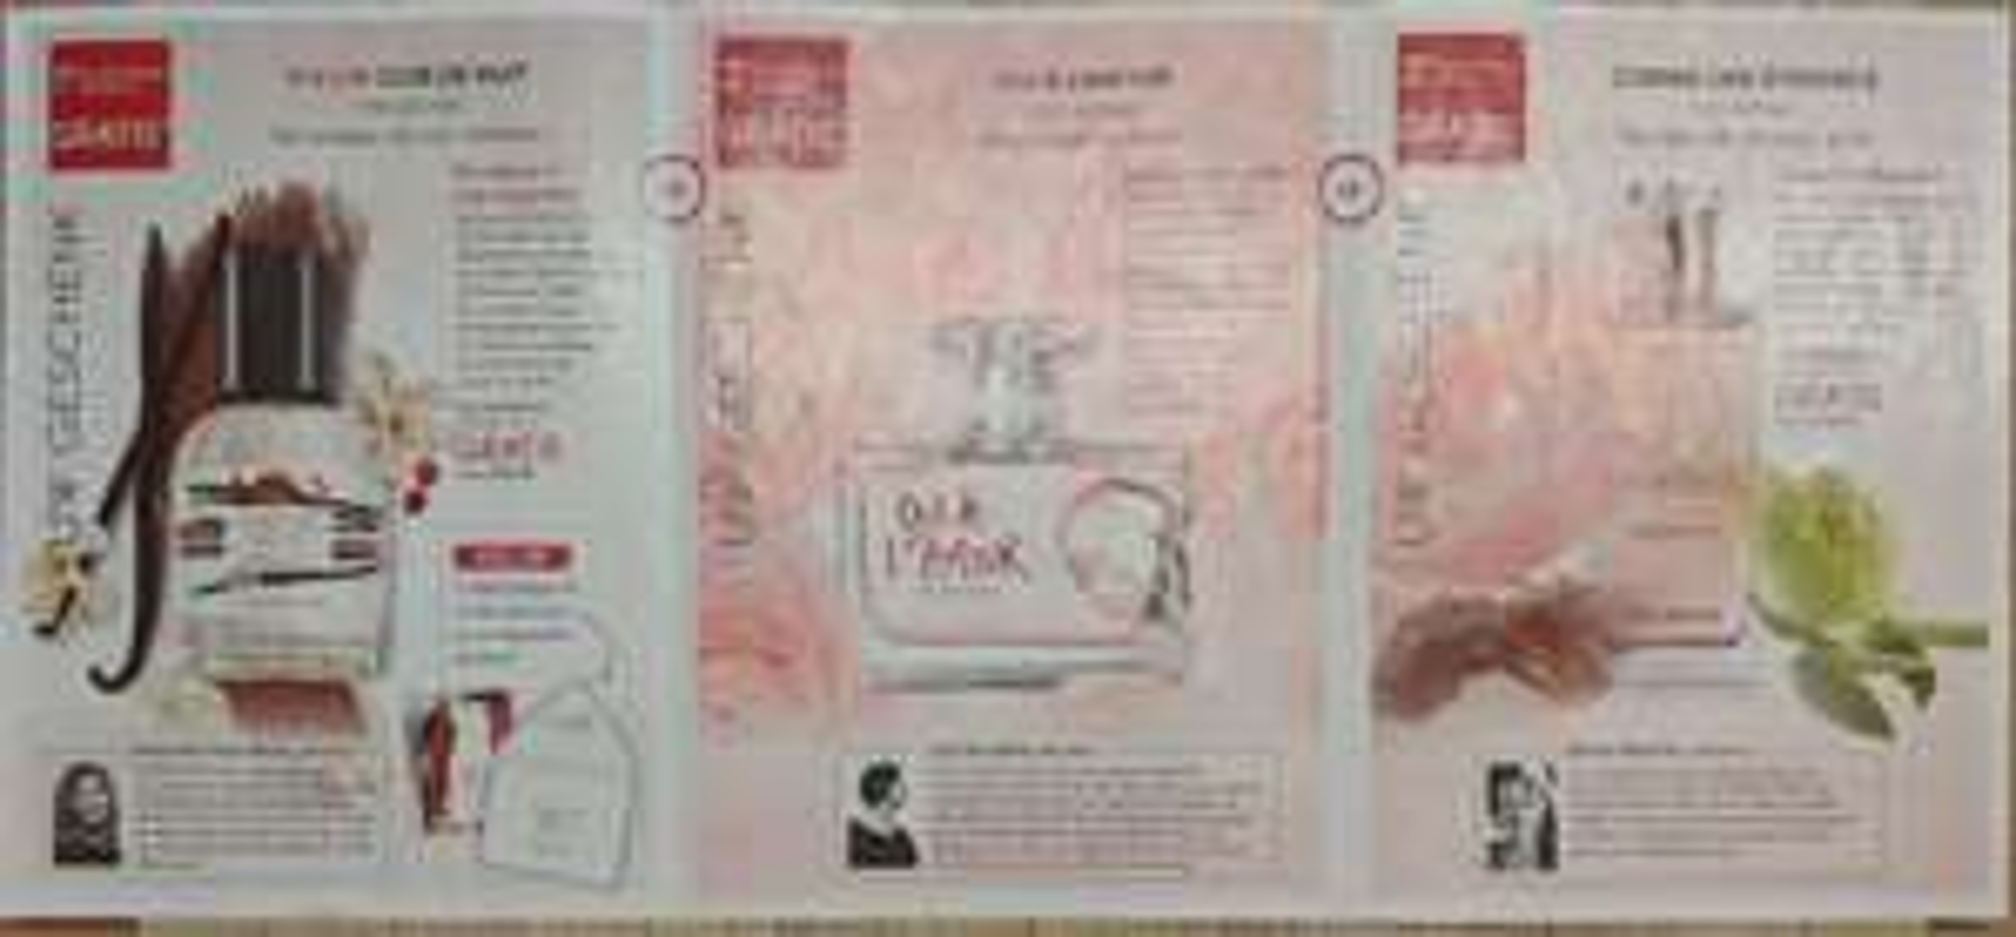 10 Euro voor 30 ml of 50 ml Eau de Parfum ,belangrijk zie omschrijving, Cuir De Nuit of Oui A Lamour of Comme Une Evidence, Yves Rocher.